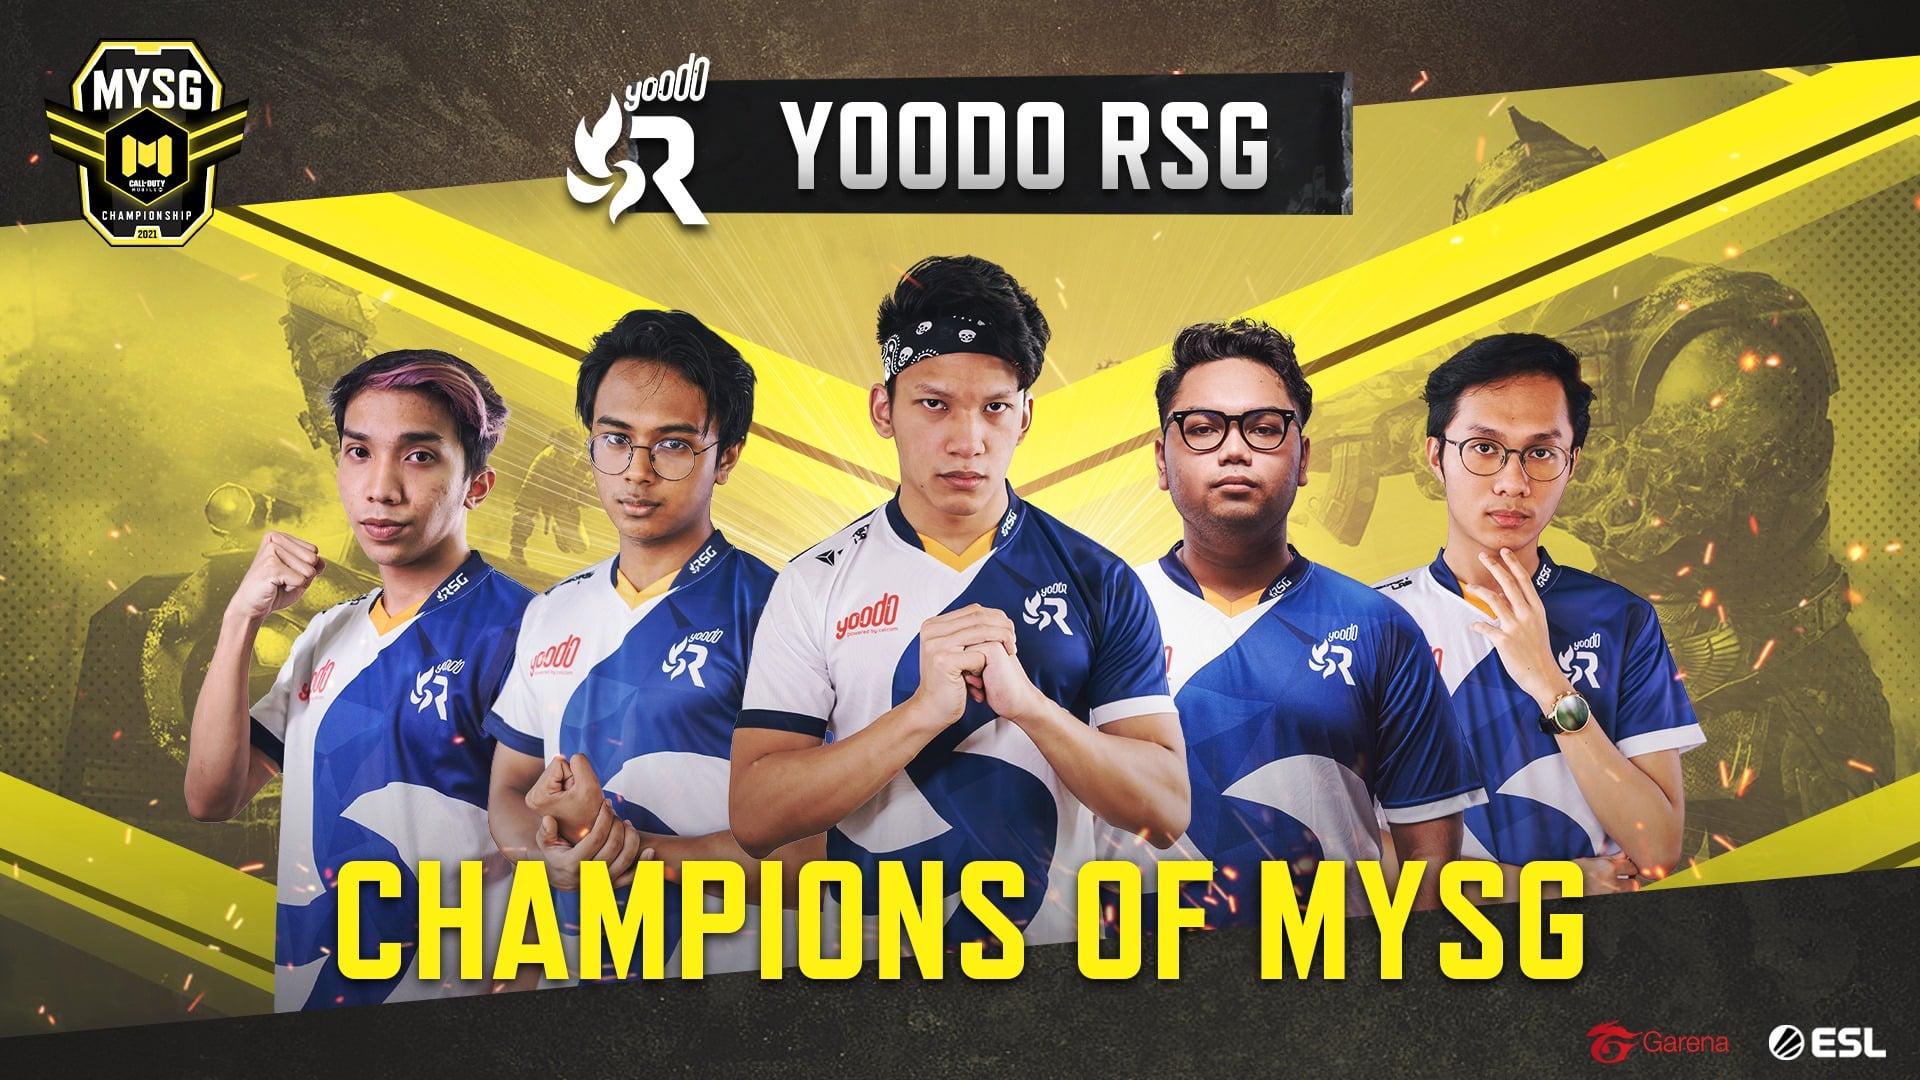 Yoodo RSG muncul juara kejohanan Call of Duty Mobile (CODM) MYSG Championship 2021 selepas menewaskan wakil Singapura, Divinity.Uprising